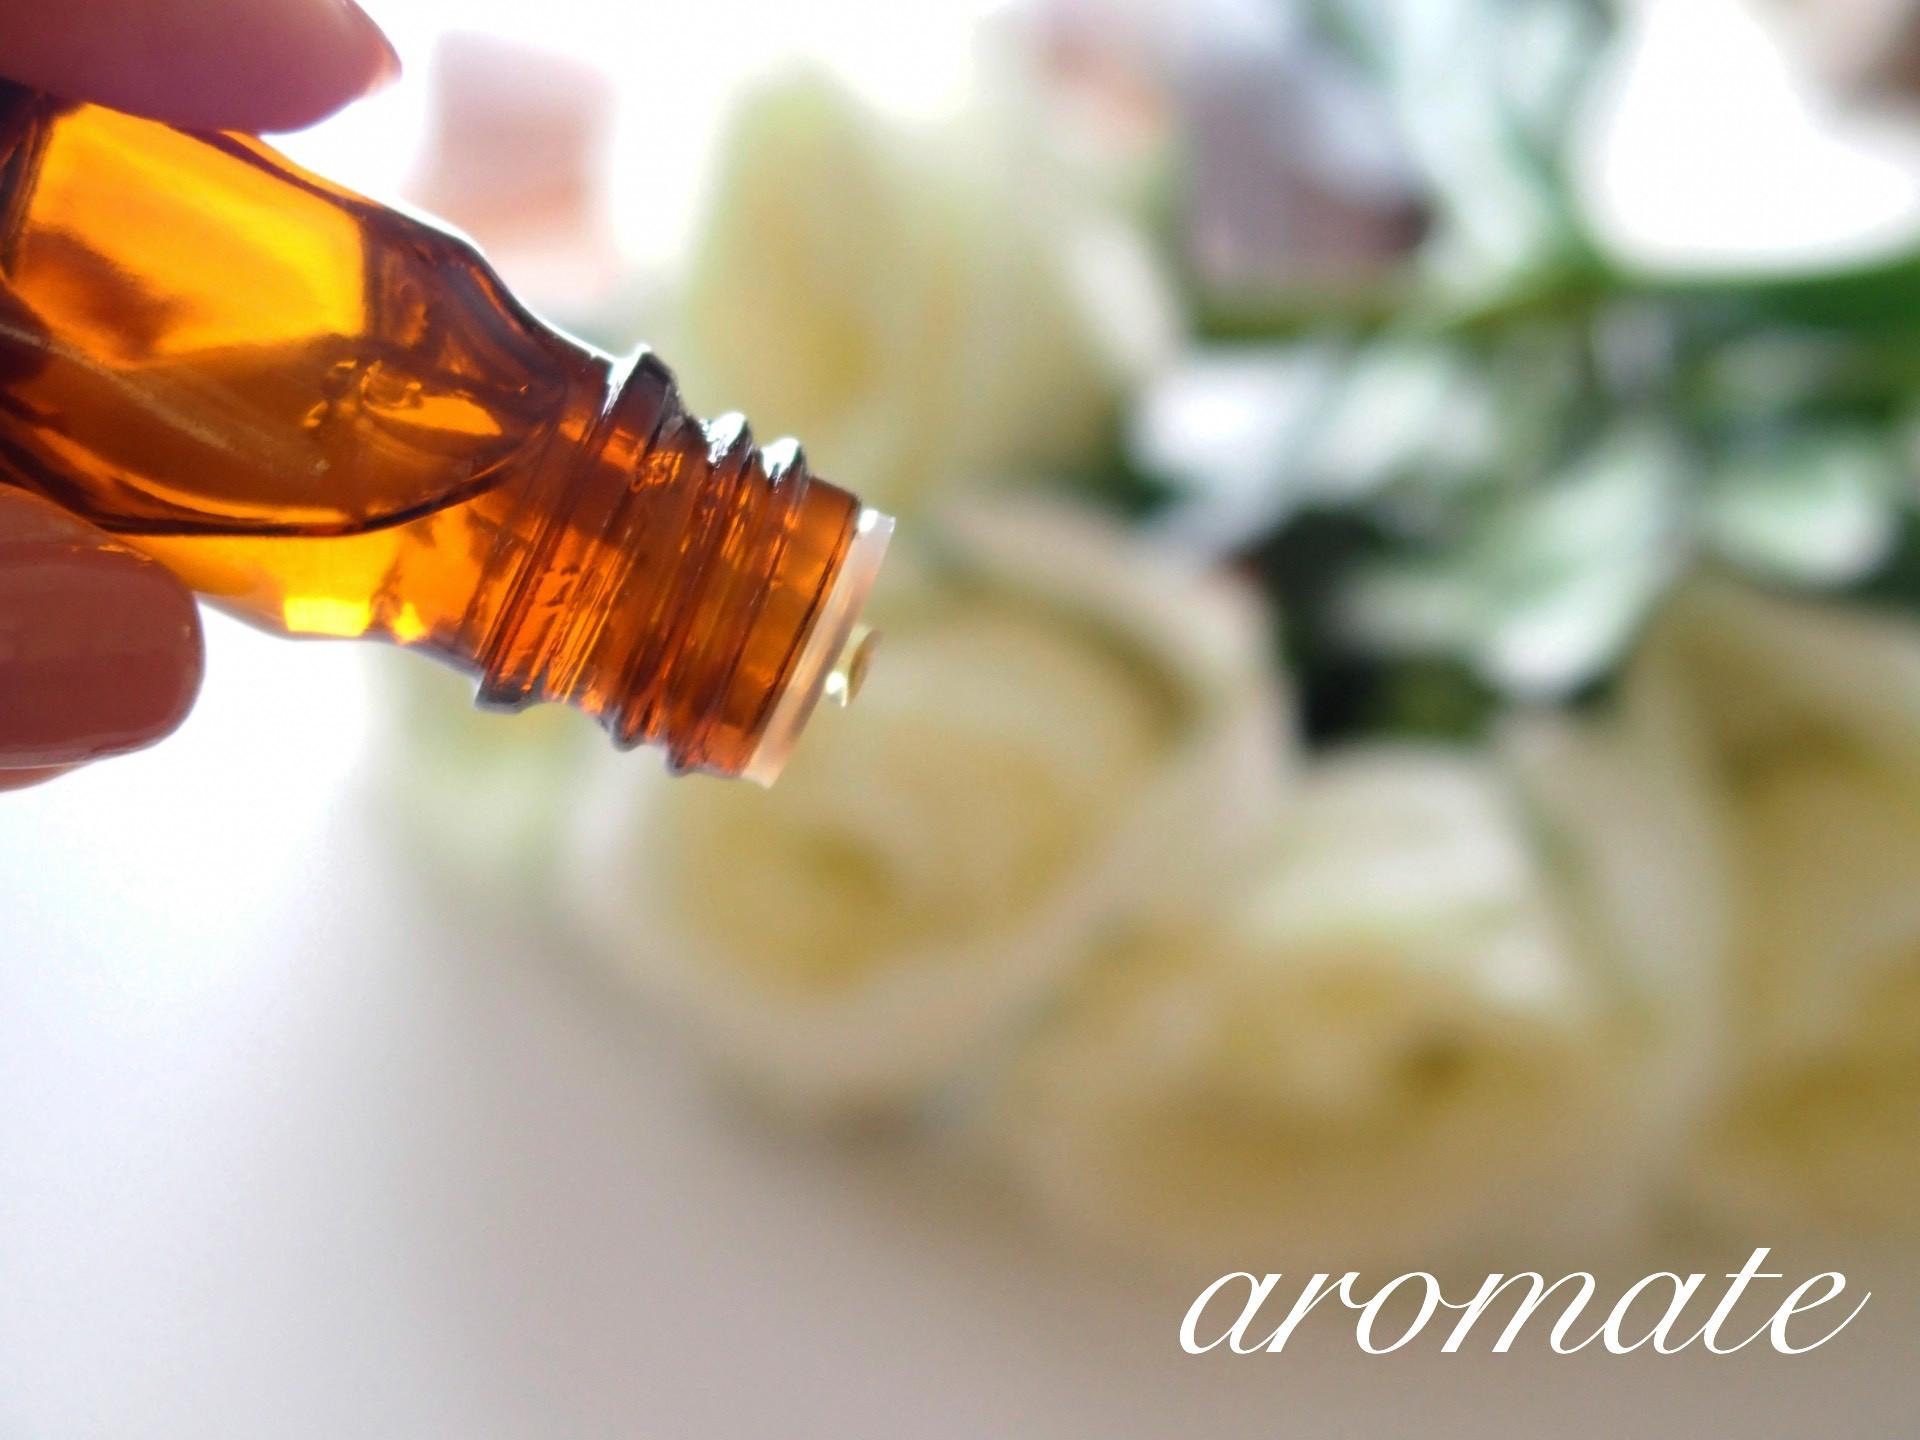 aromate shop